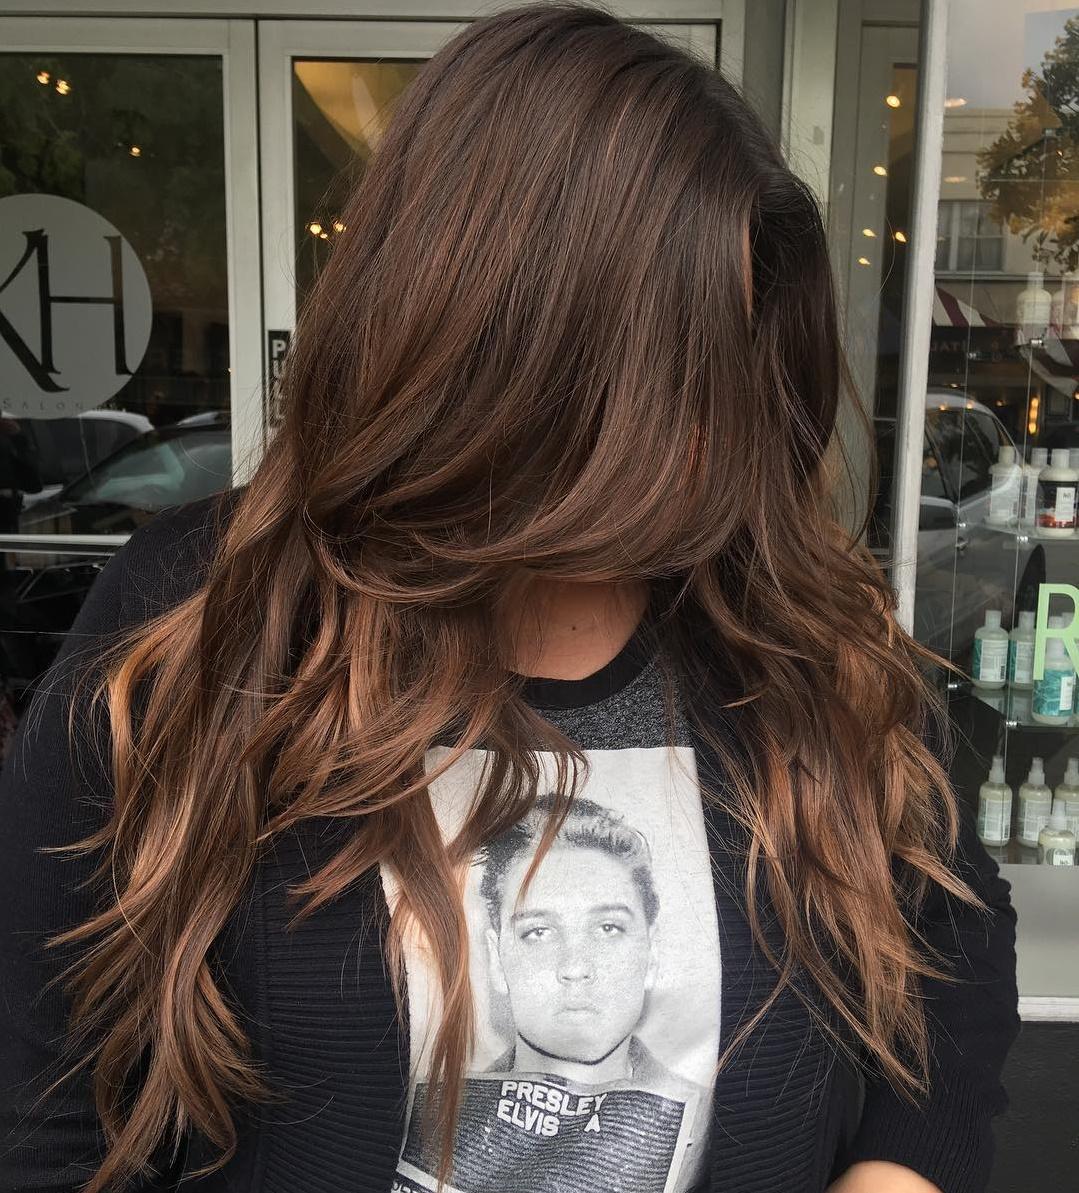 Chocolate Brown Hair with Long Bangs